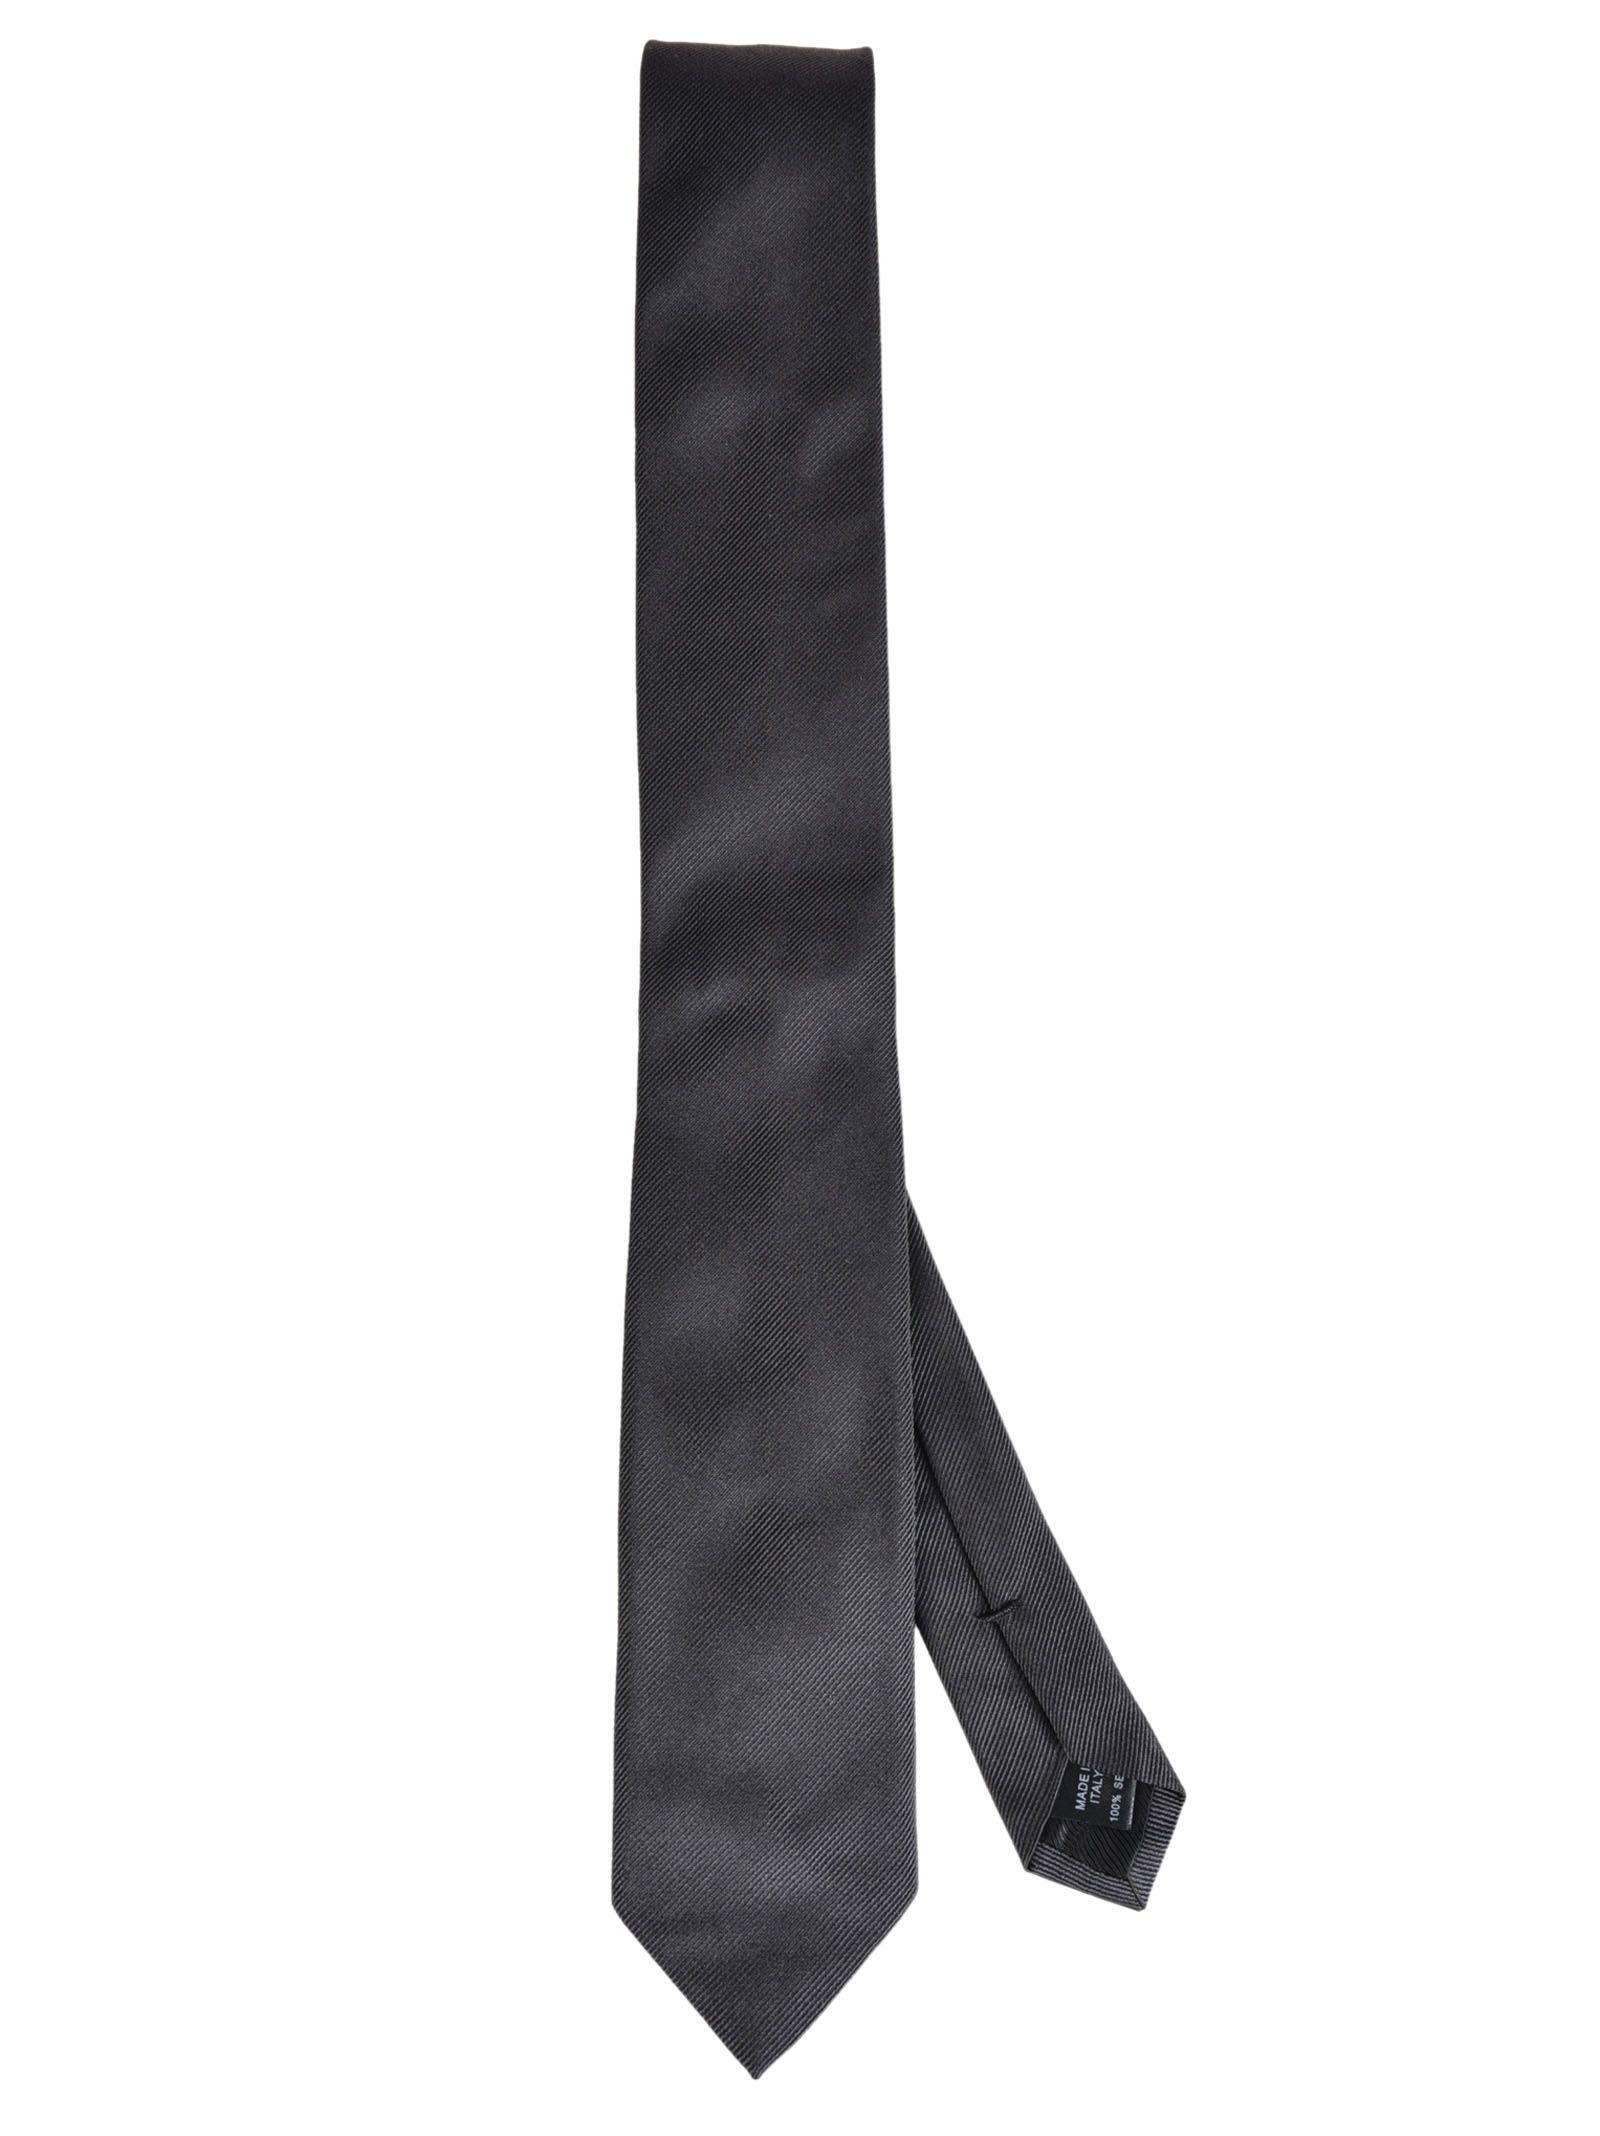 Dolce & Gabbana Stripe Textured Tie In Grigio Scuro